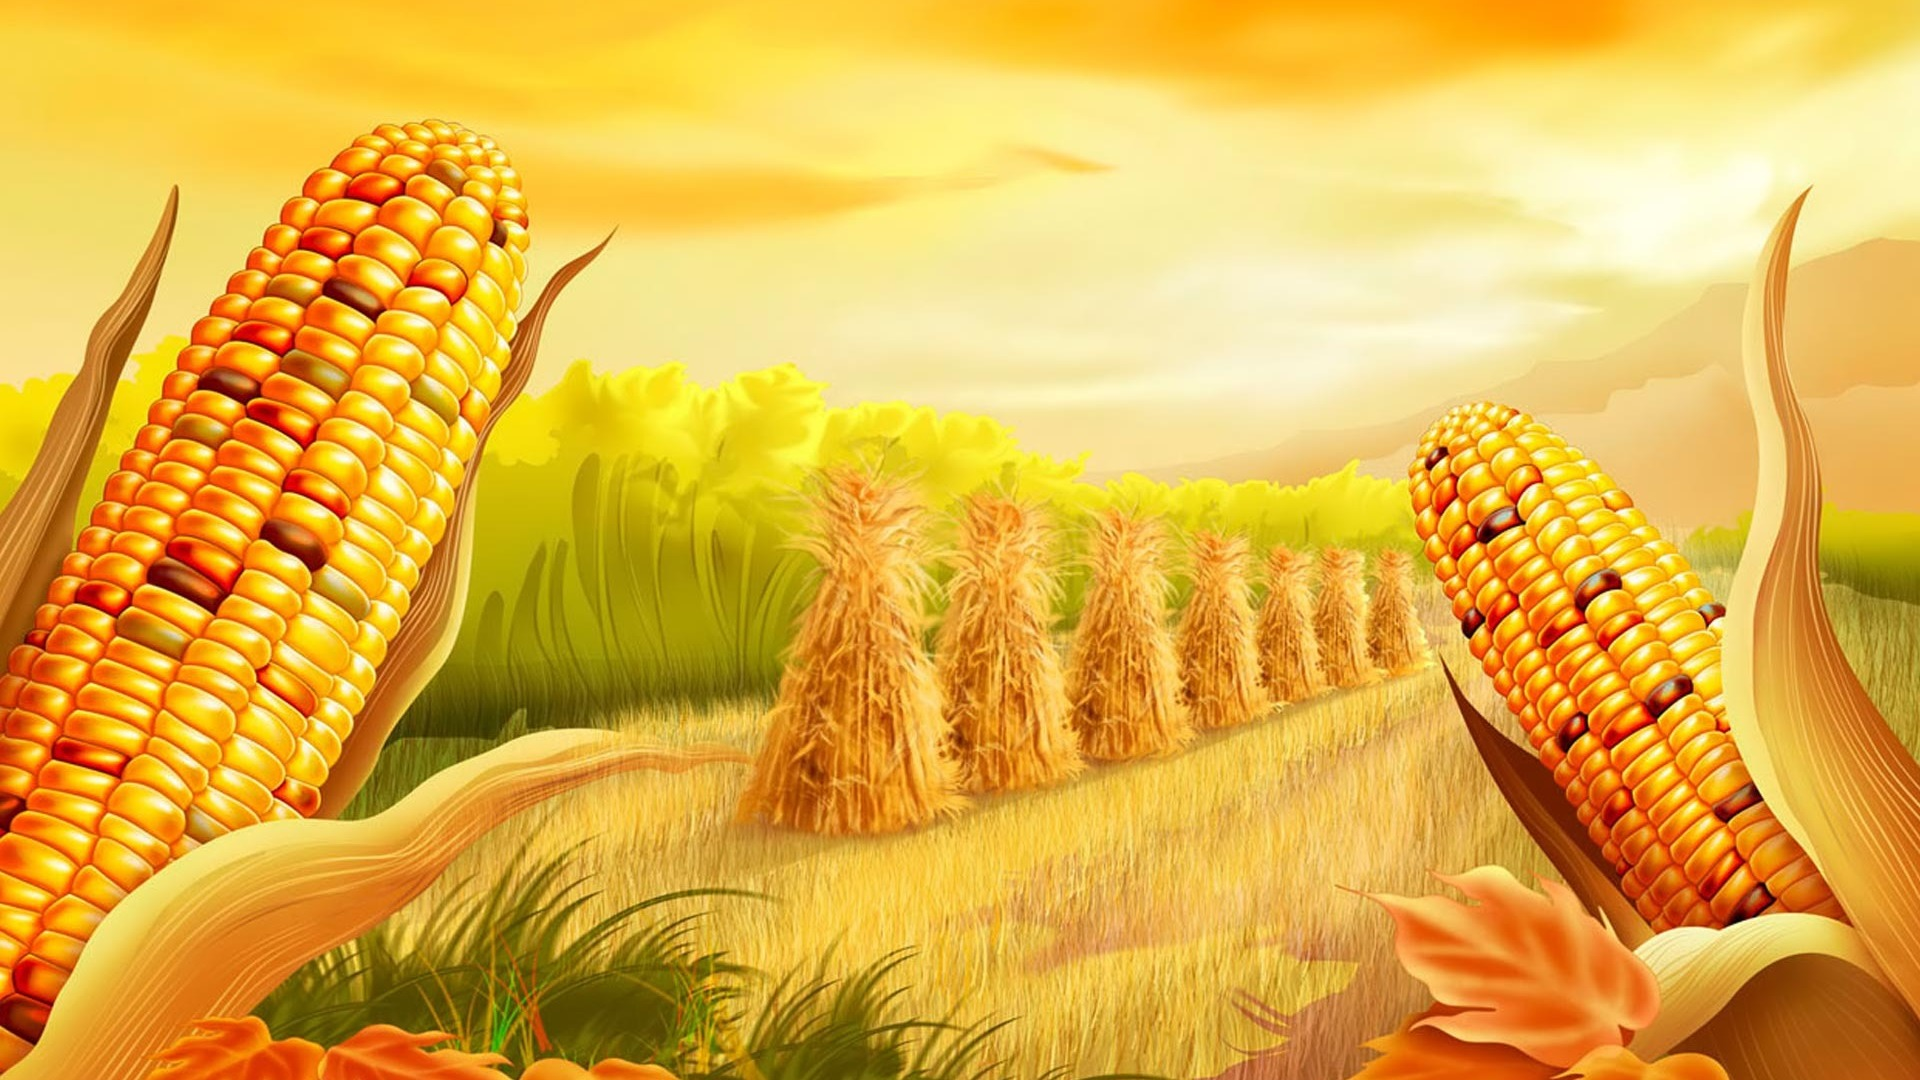 Corn Ready To Harvest